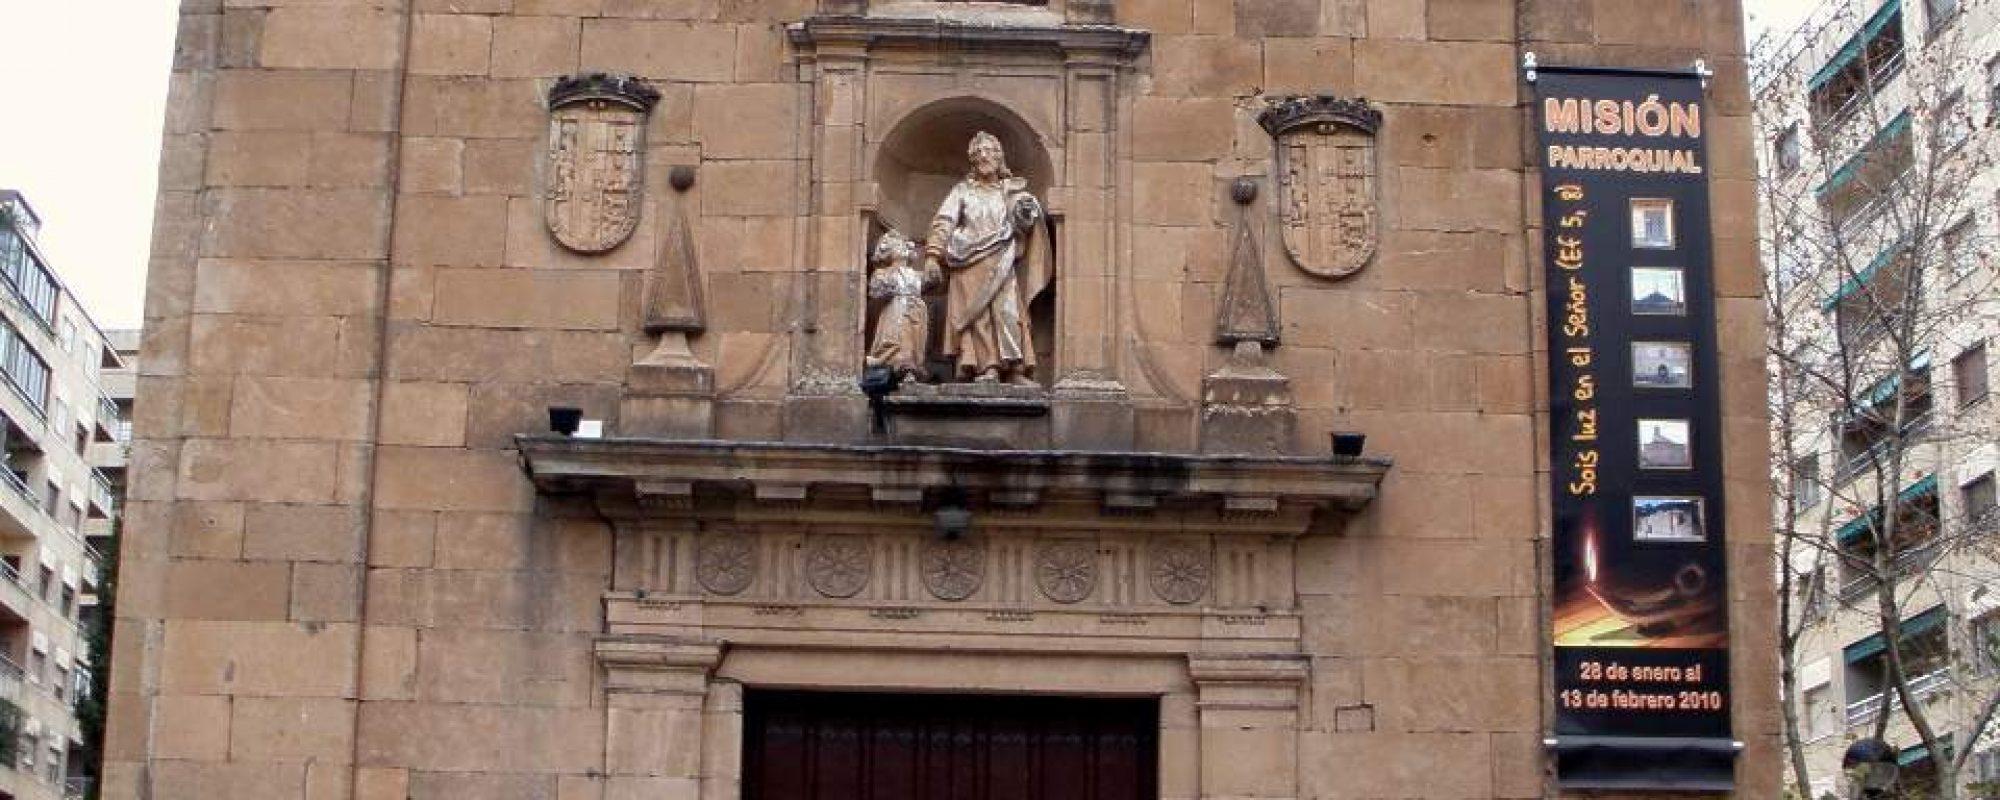 Salamanca_-_Iglesia_de_Santa_Maria_del_Monte_Carmelo_02